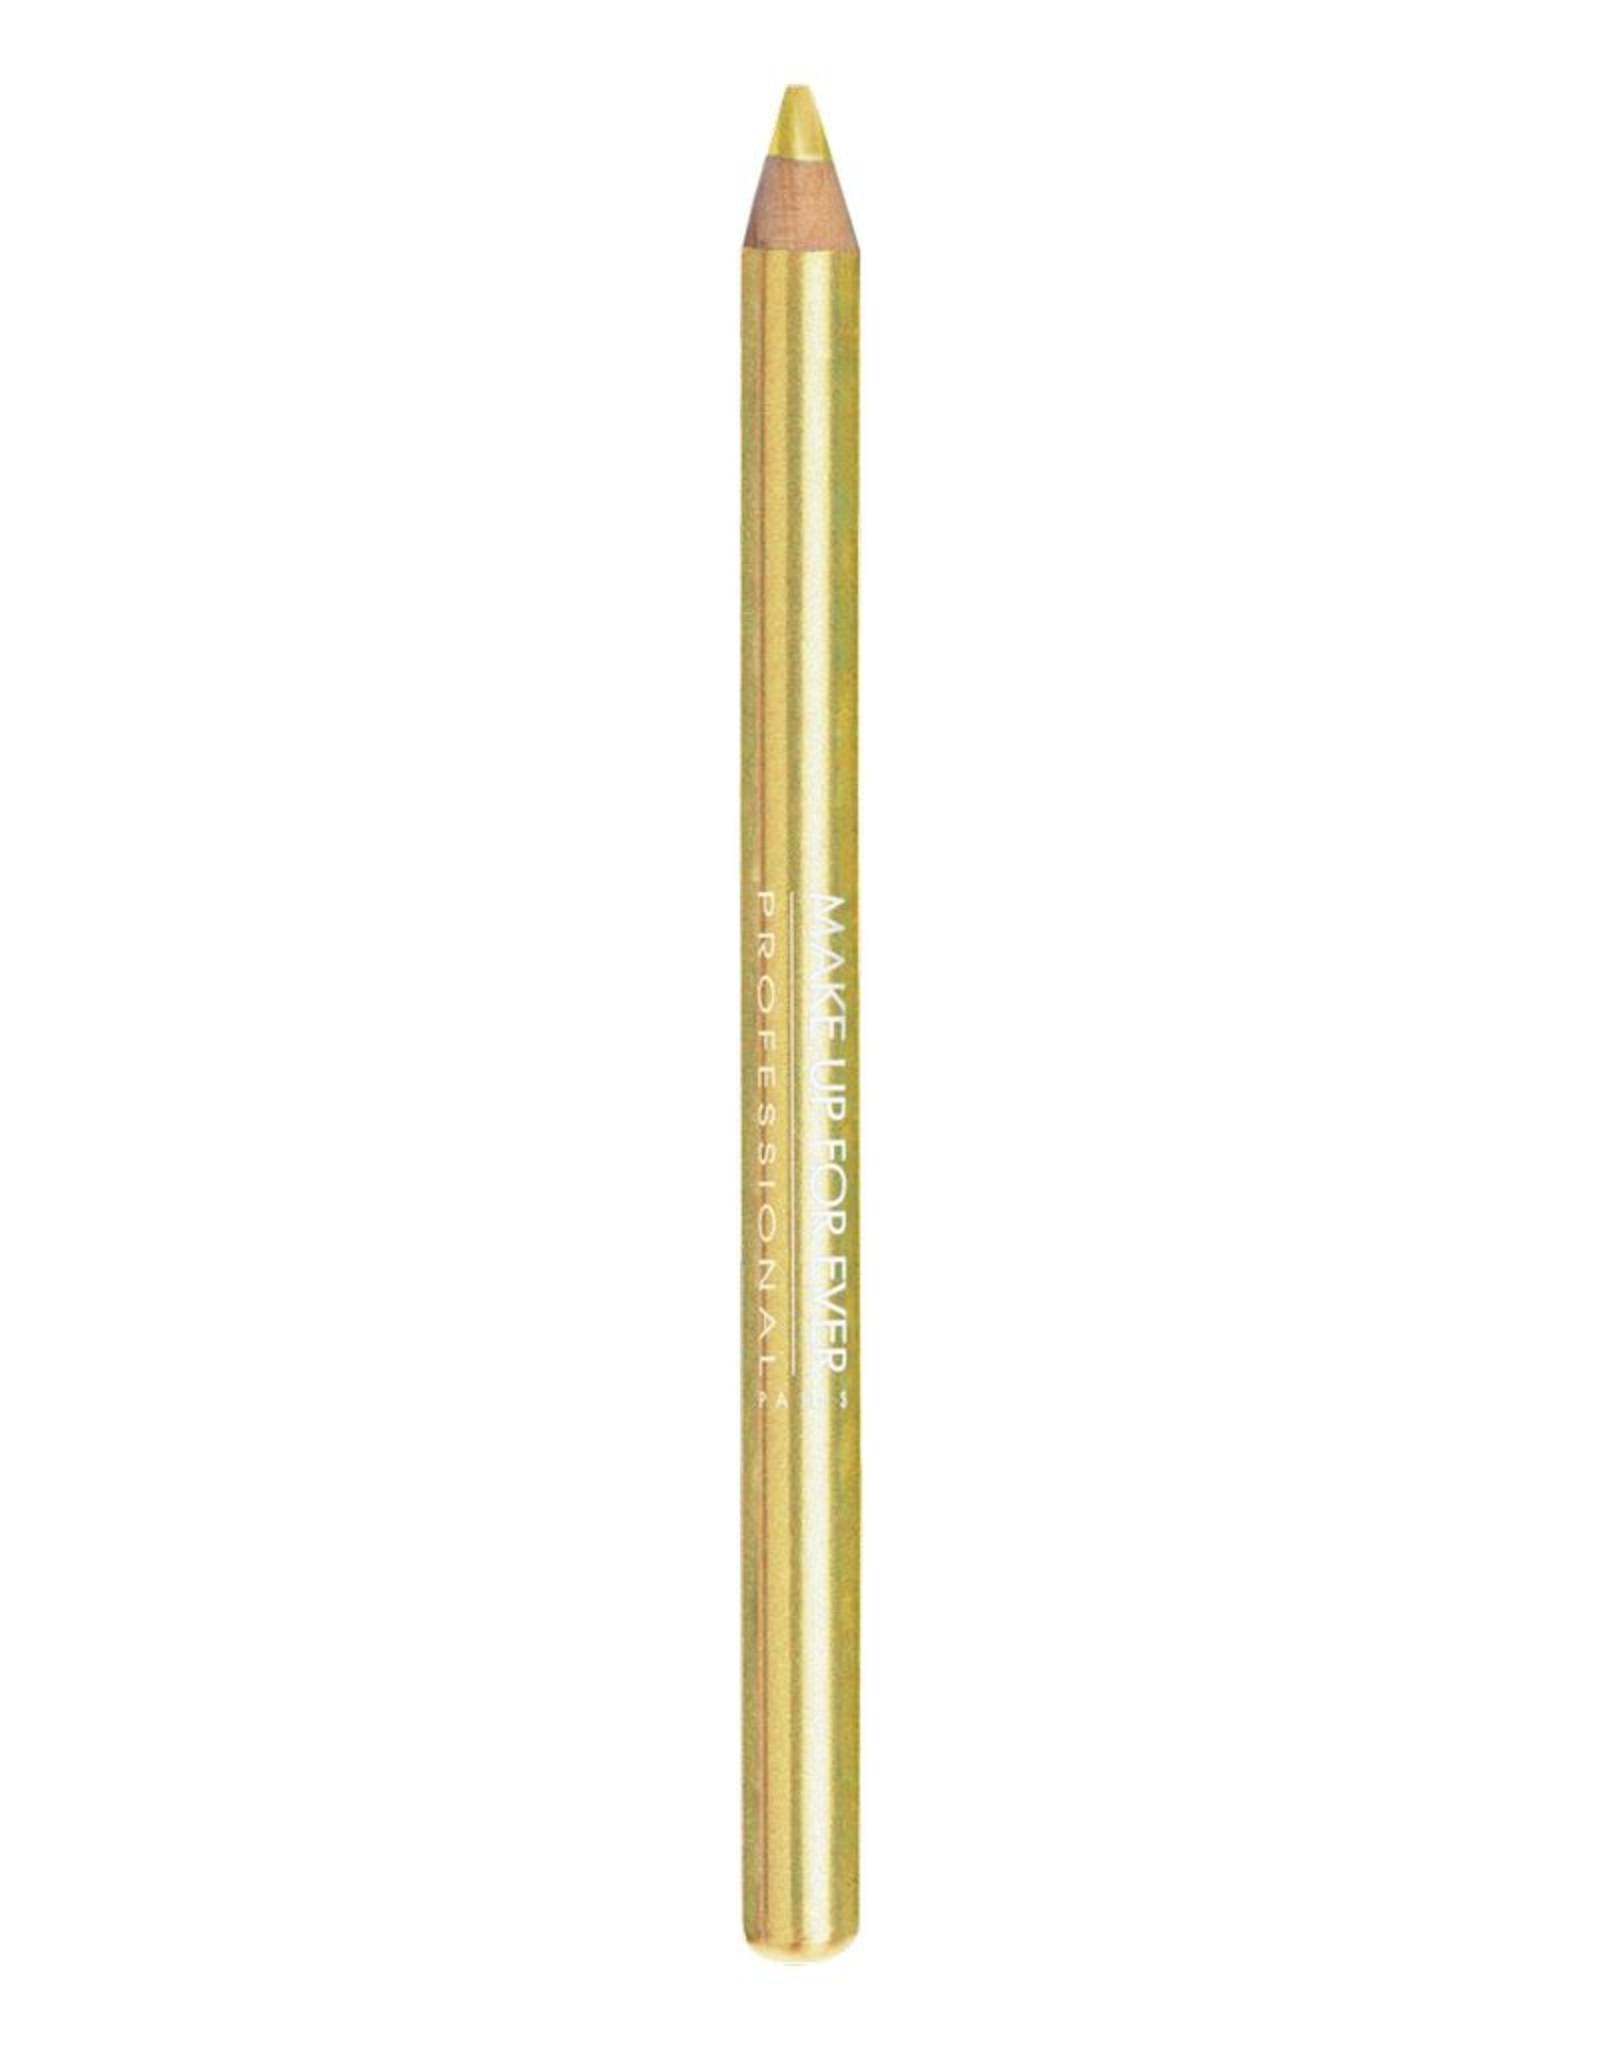 MUFE CRAYON KHOL 1,14g7K - metal dore / metal gold  (MB 354 look gold ic™ne)